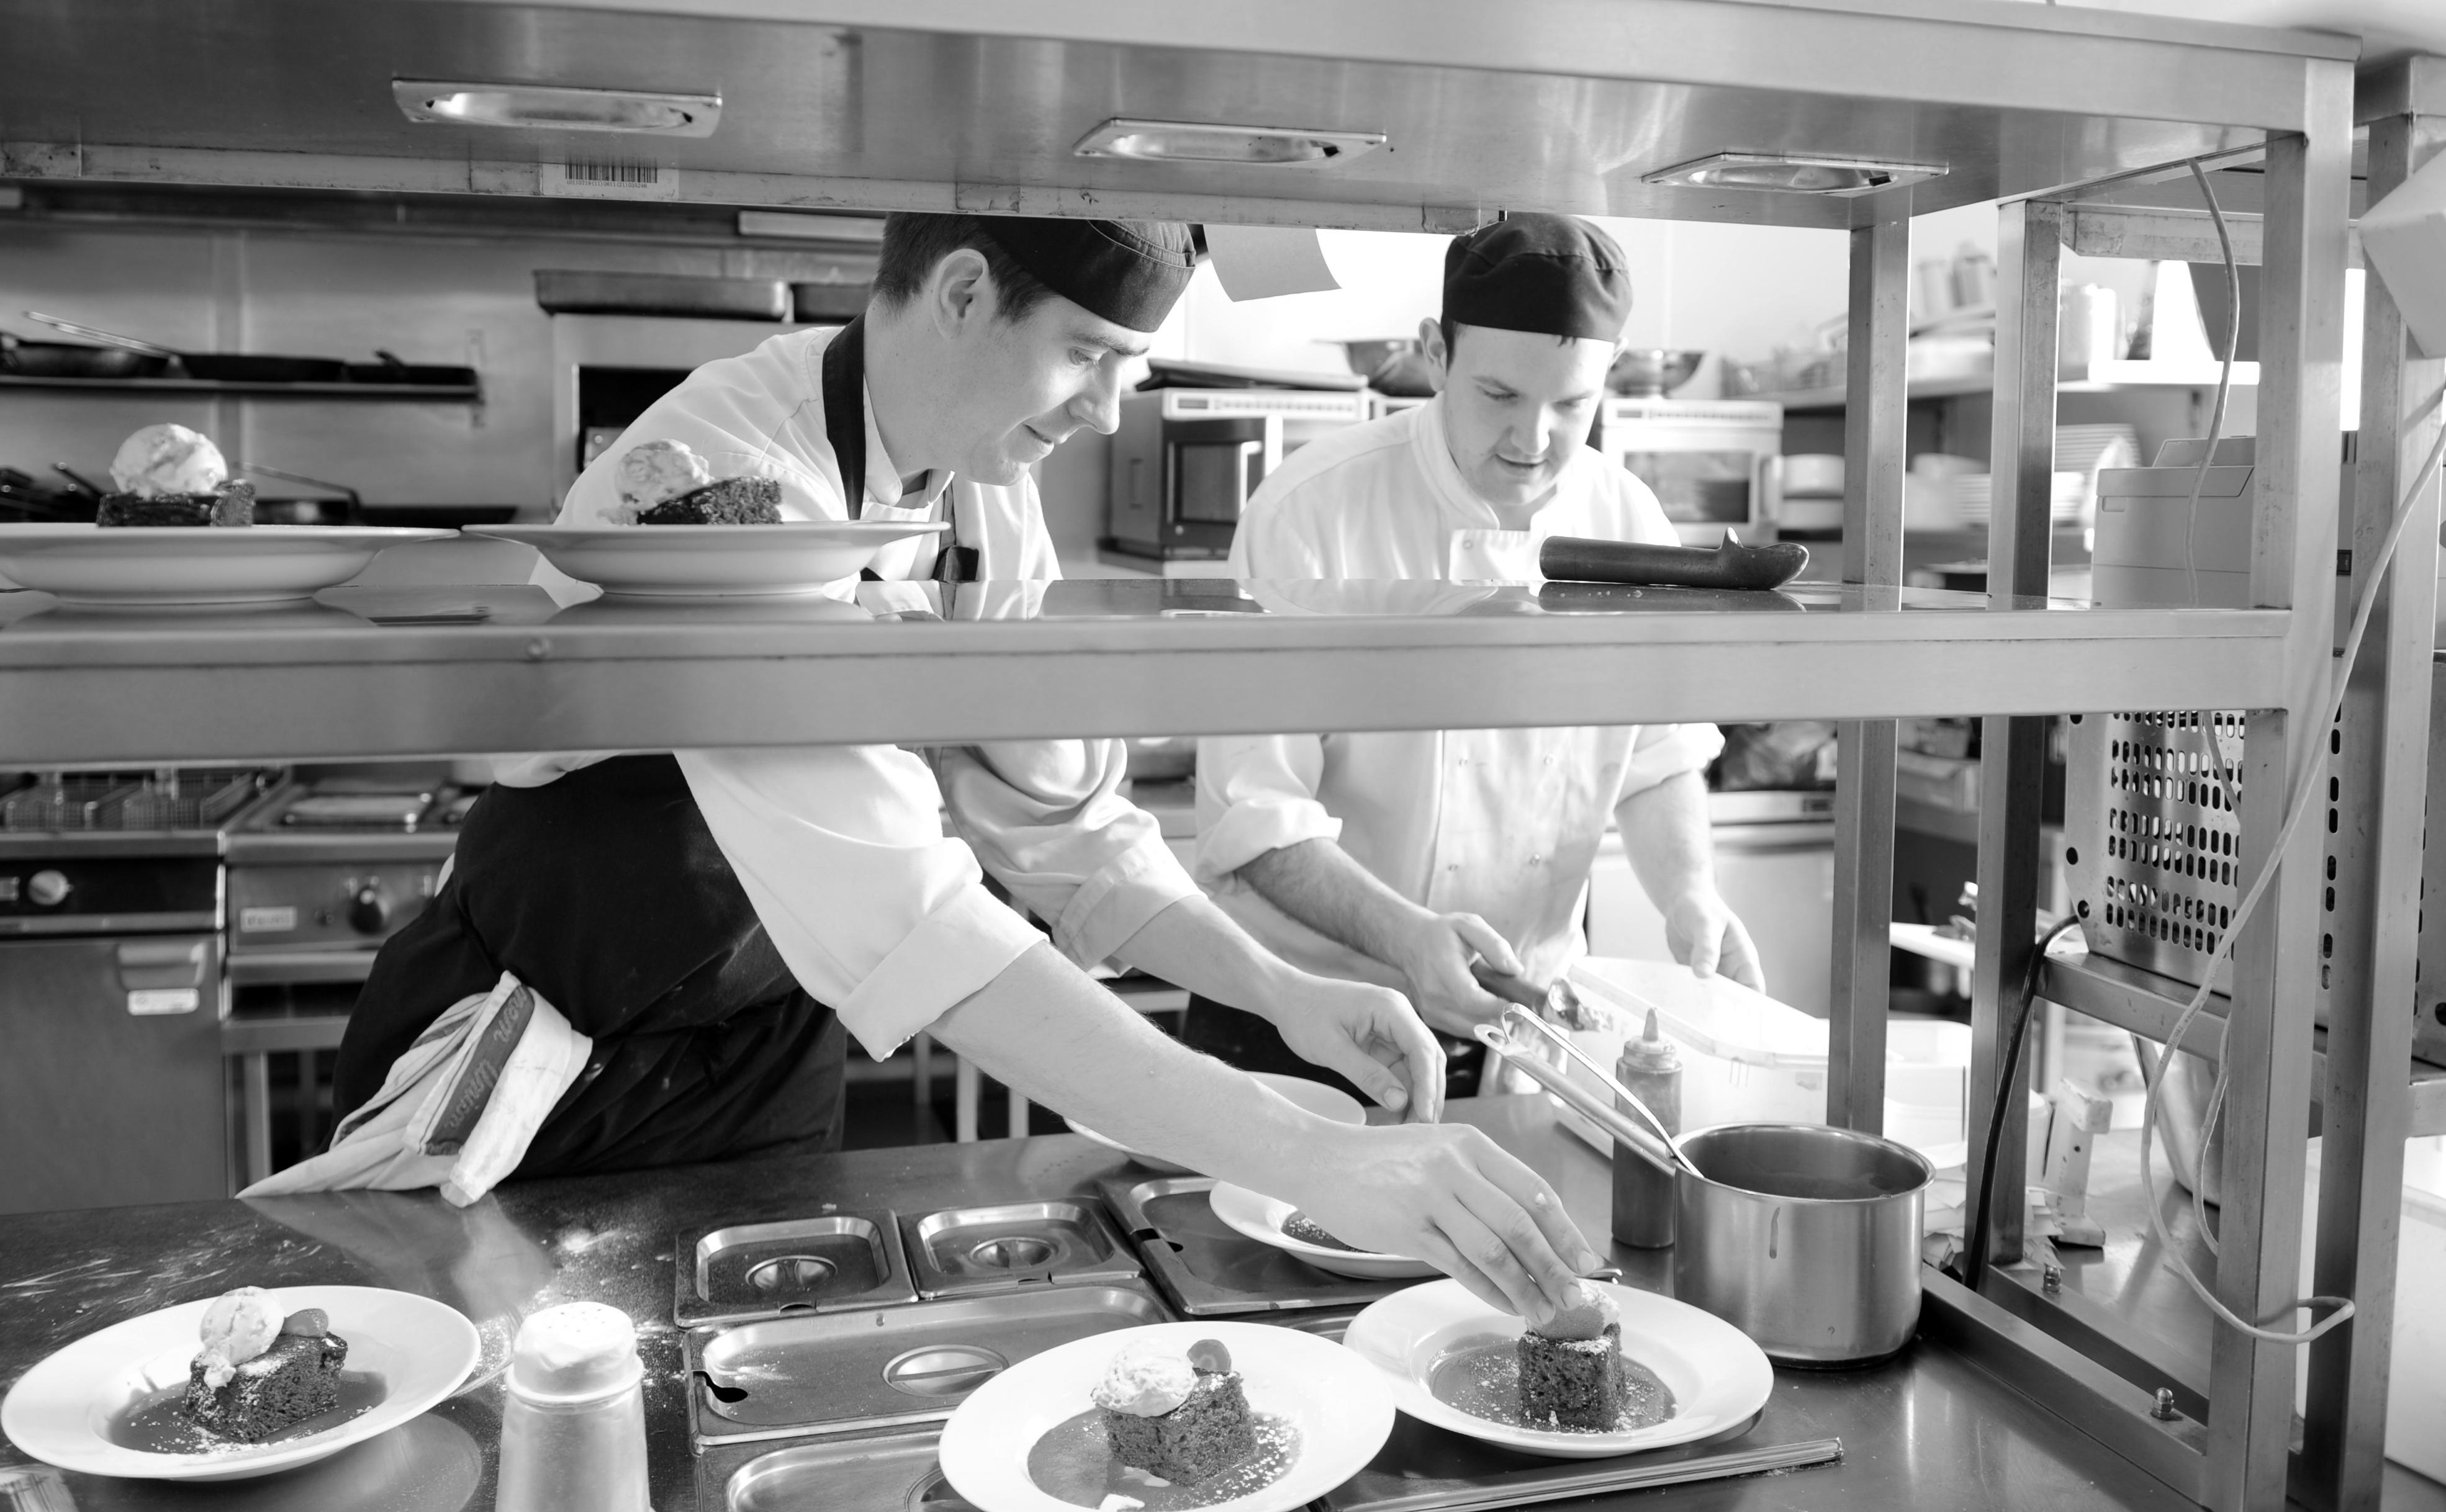 Chef's in action @ Haddon Restaurant